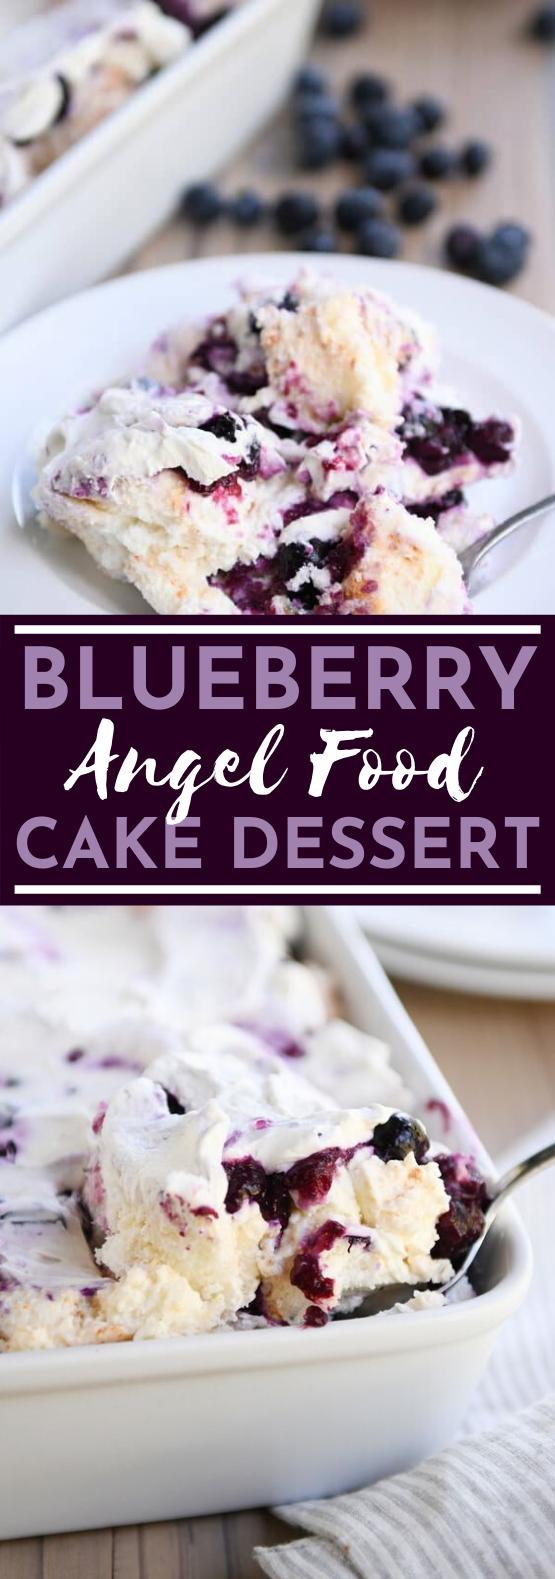 Blueberry Angel Food Cake Dessert #cake #recipes #baking #dessert #trifle